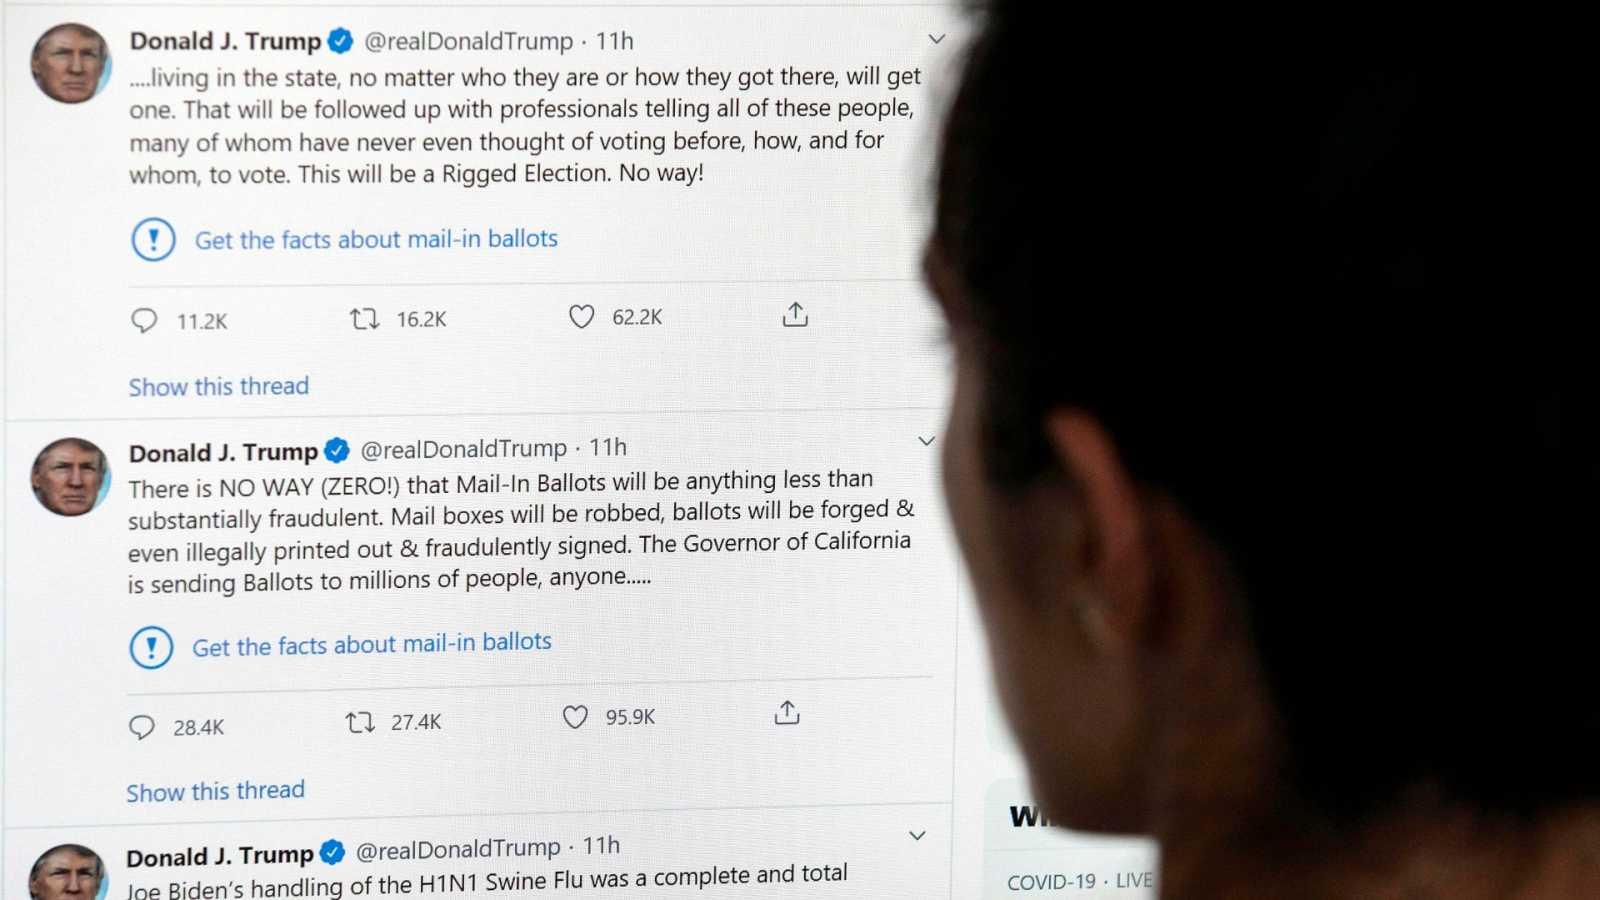 Twitter verfica por primera vez un mensaje de Trump